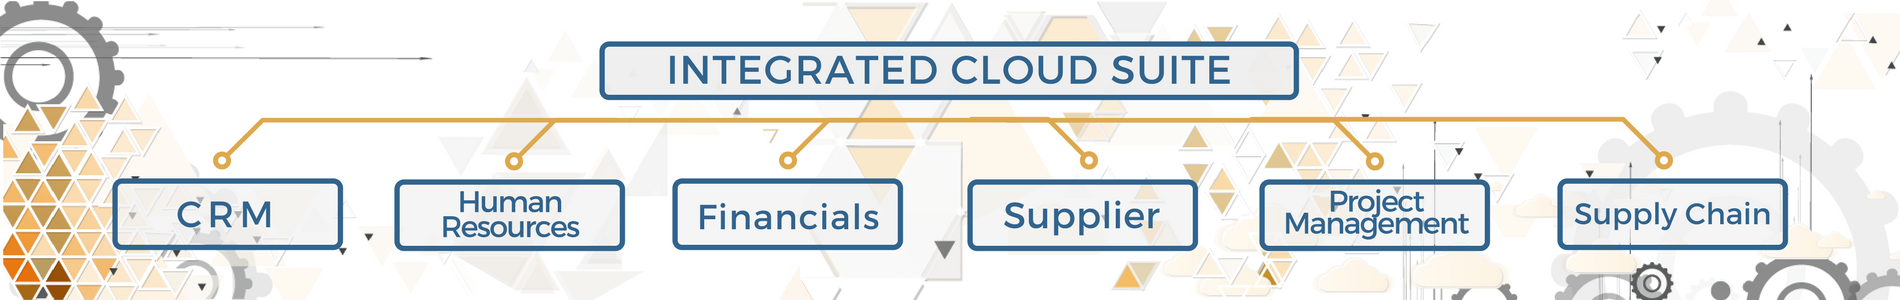 integrated_cloud_hero_image.png